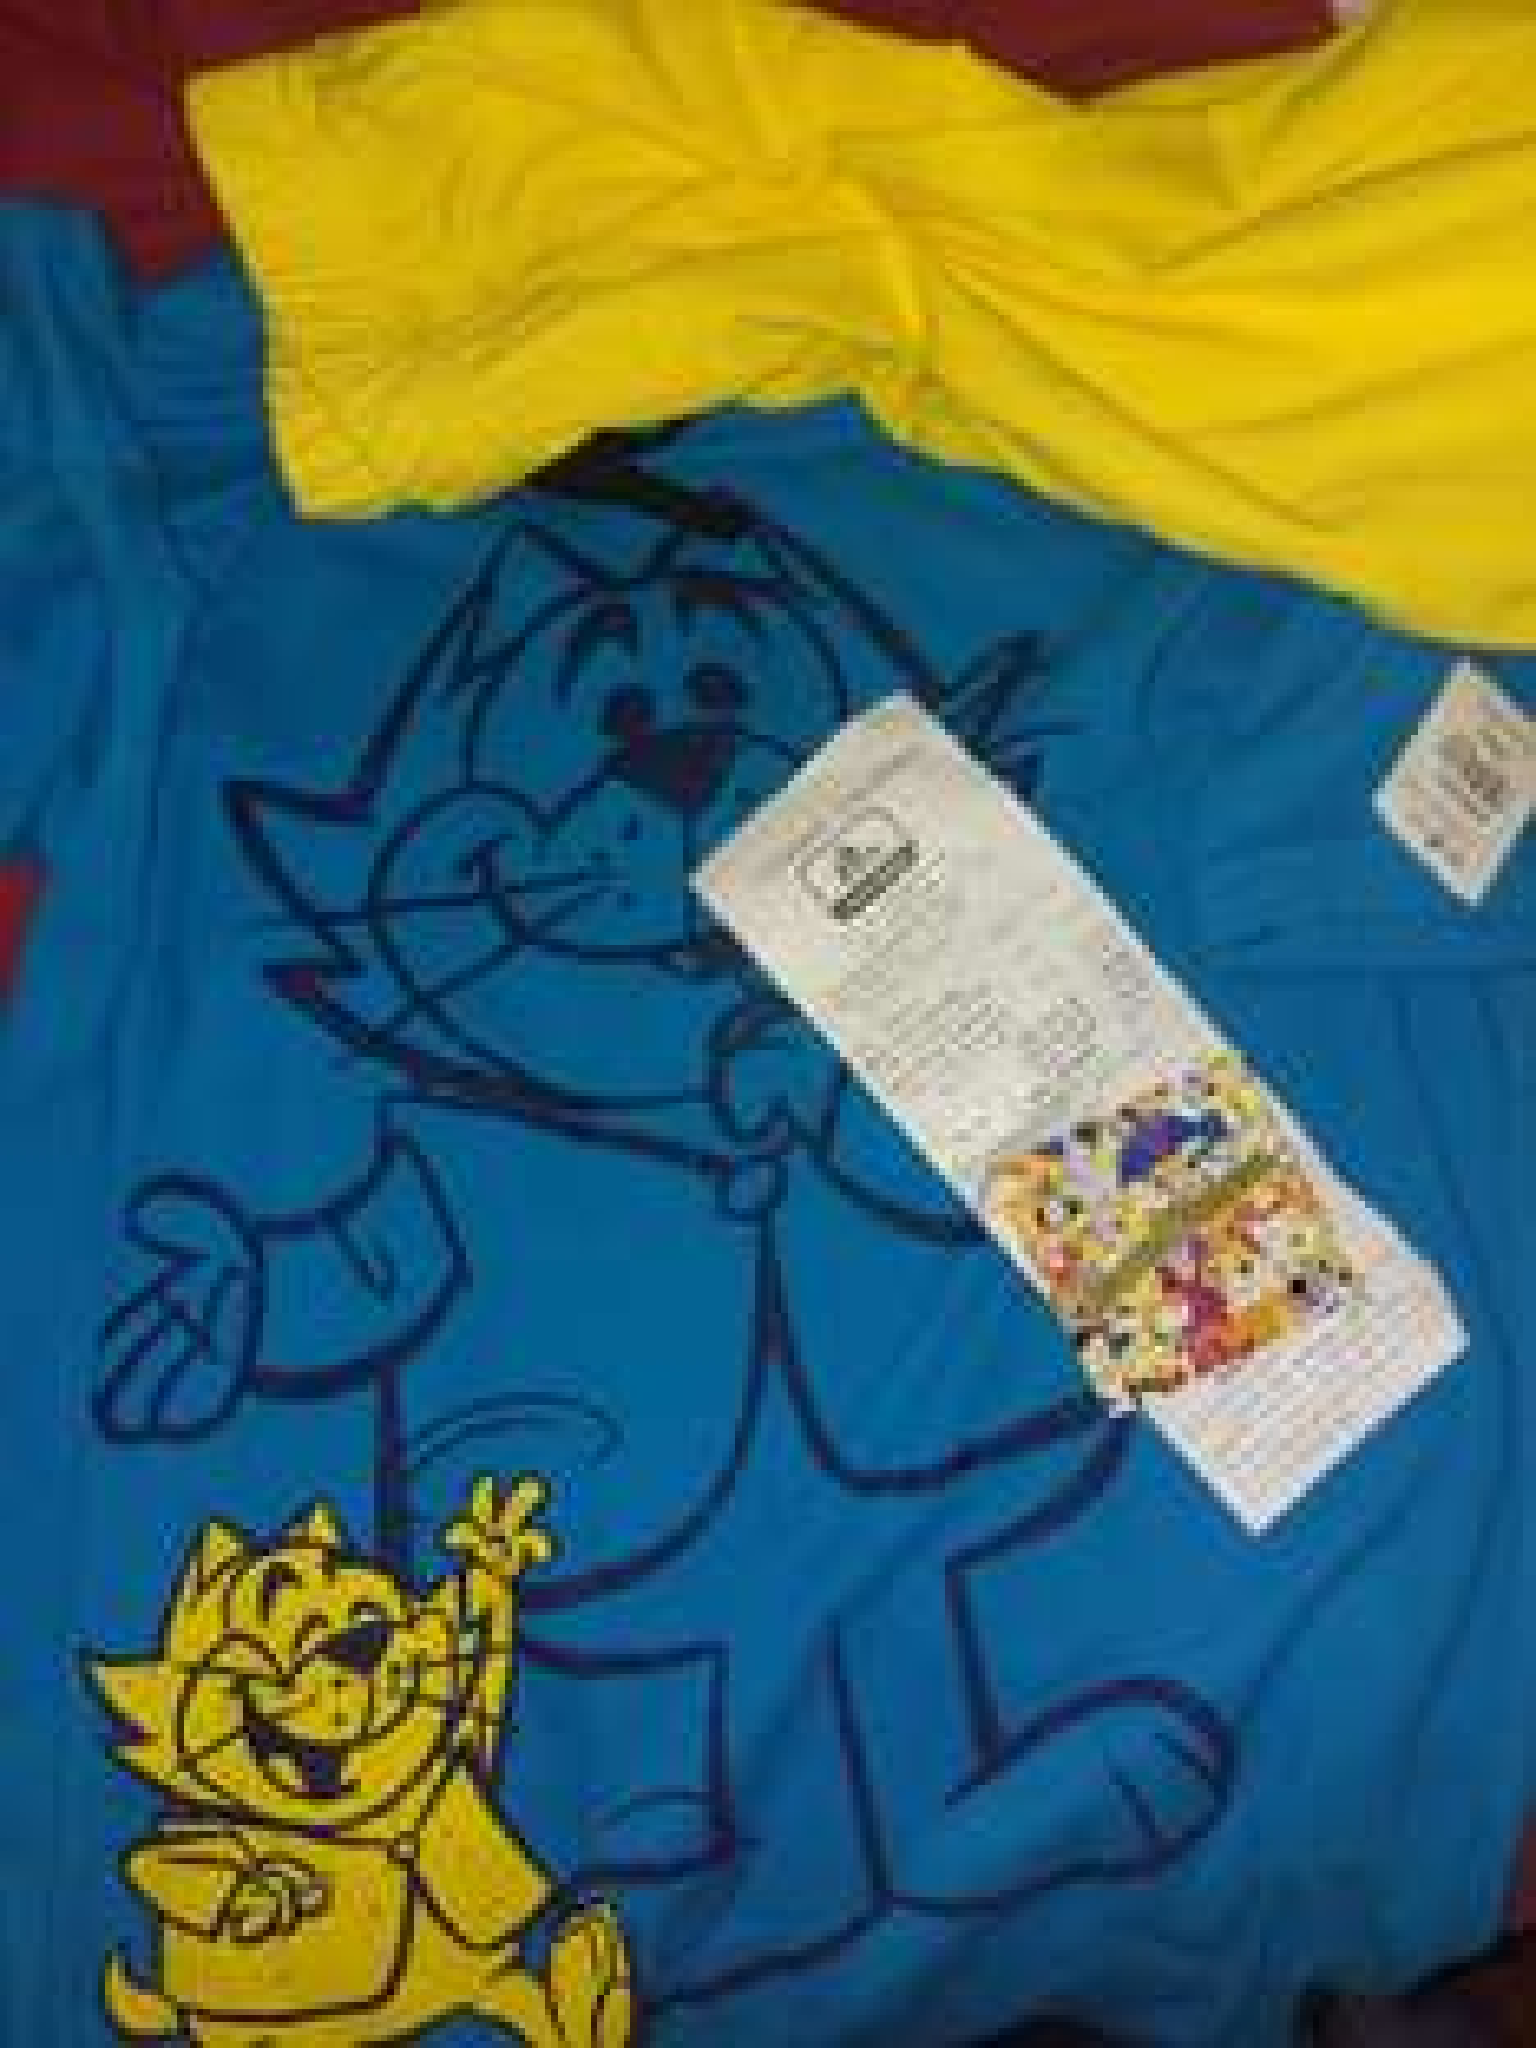 Chedraui: Pijama de Hanna Barbera, varios modelos